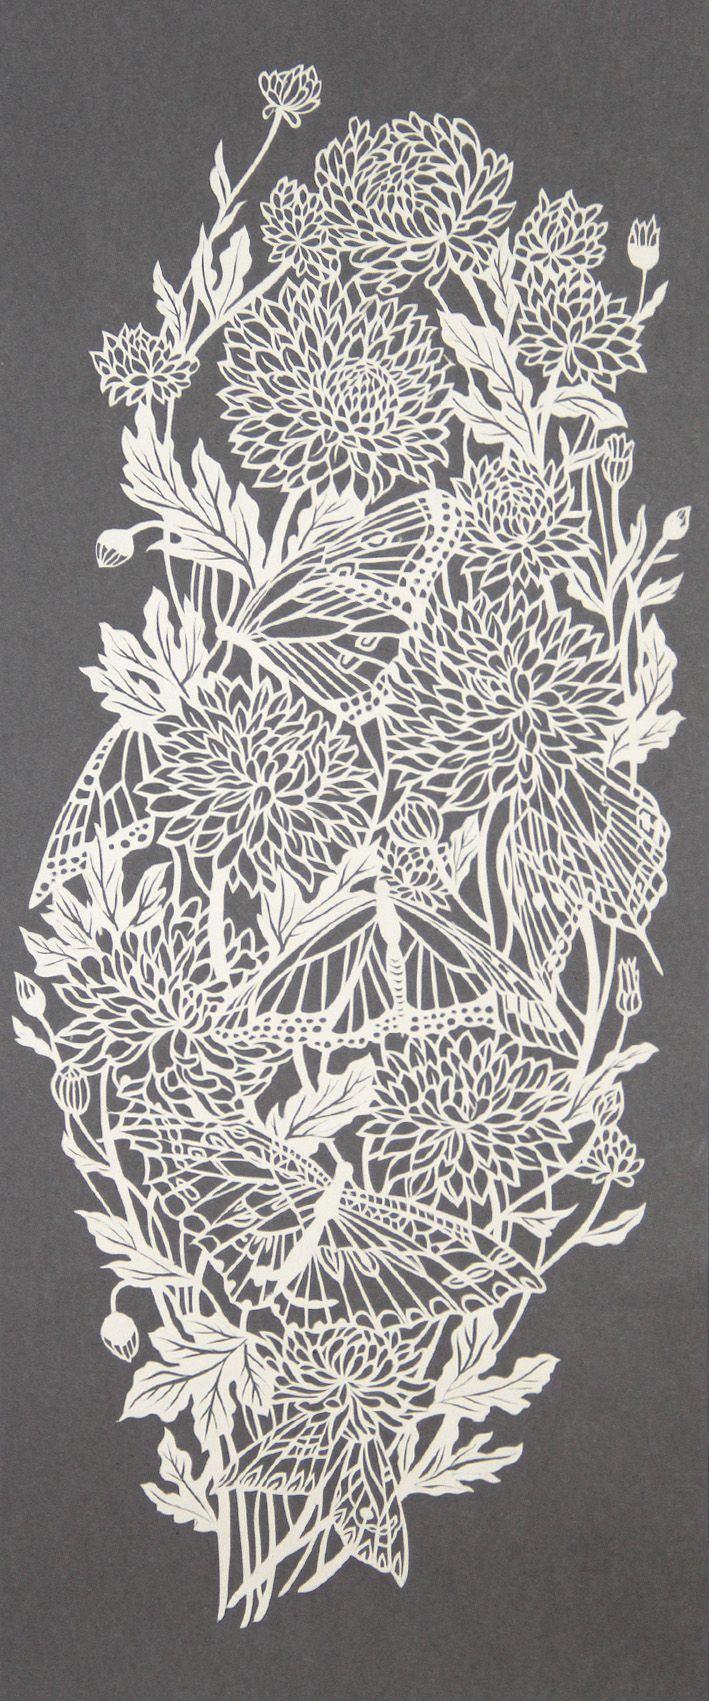 #chrysanthemums papercut                                                                                                                                                      More